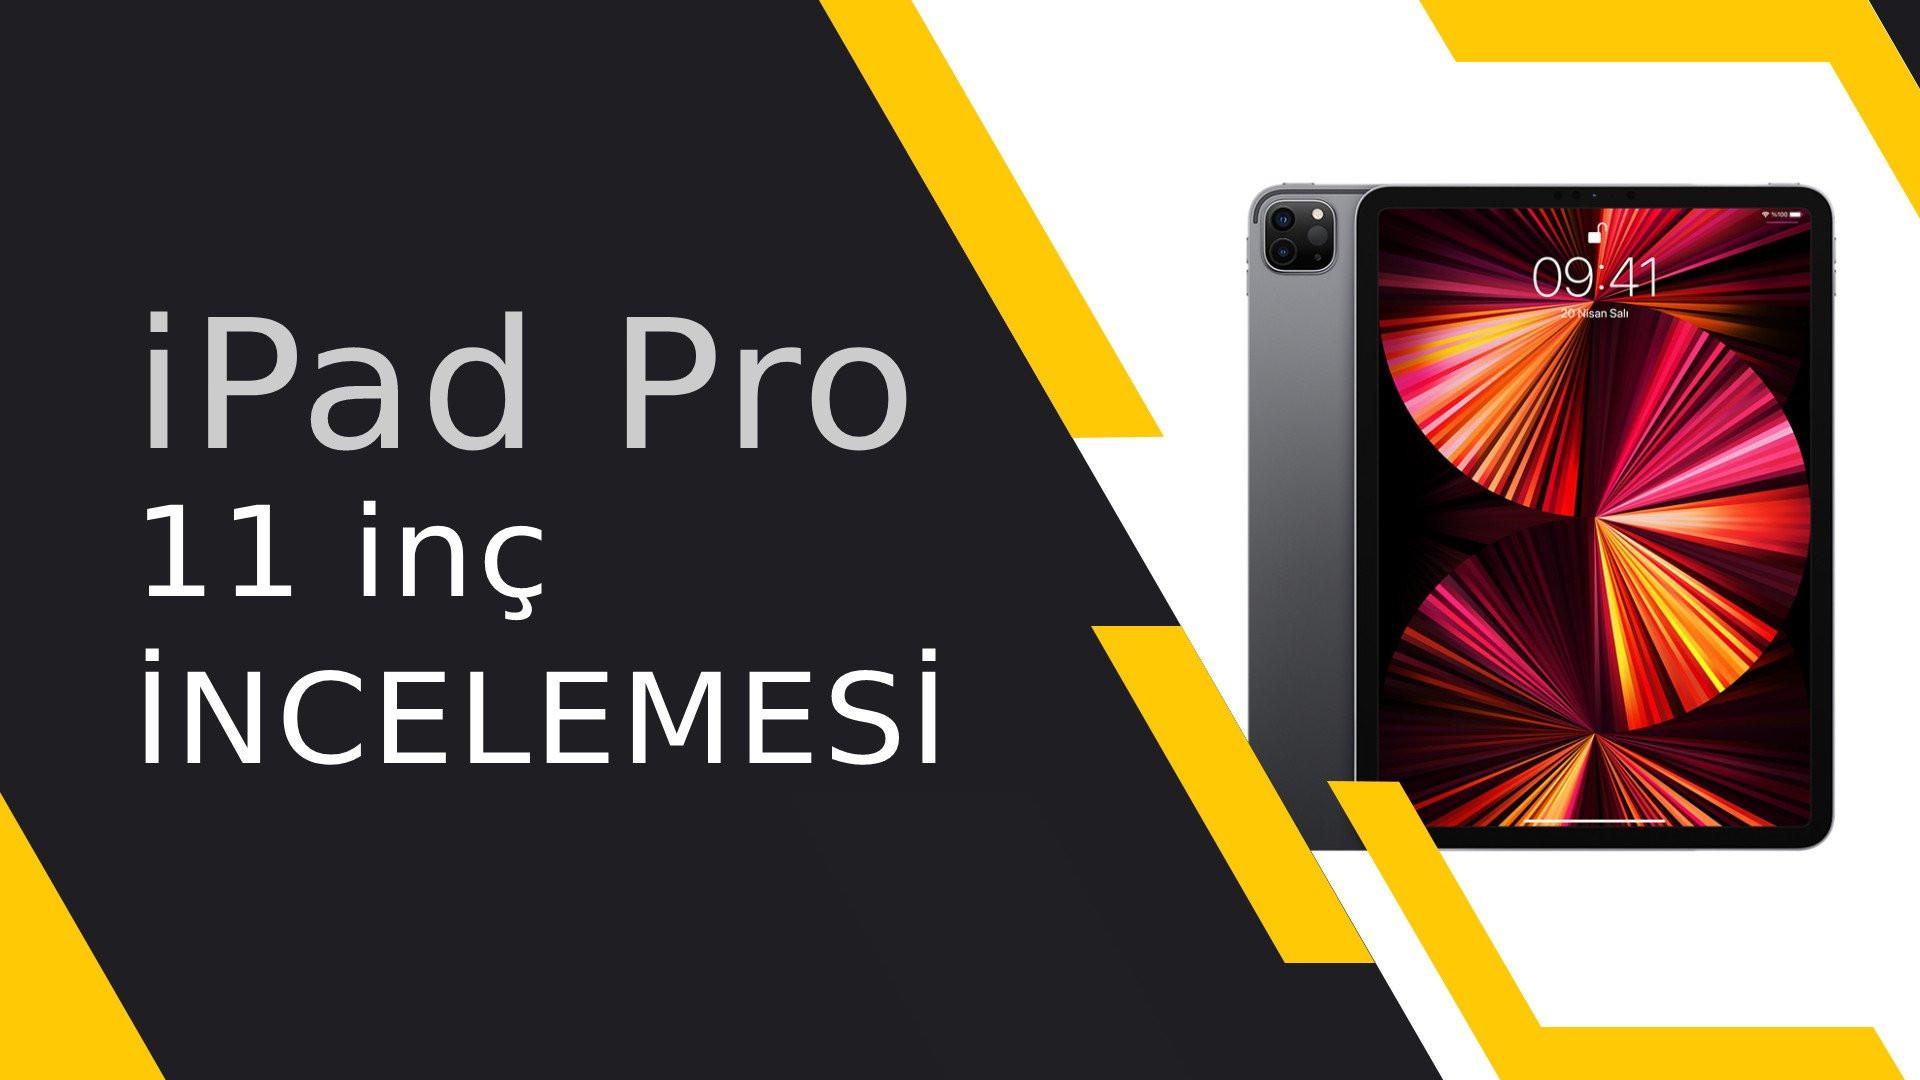 Gücünü M1 çipinden alan iPad: iPad Pro 11 inç incelemesi